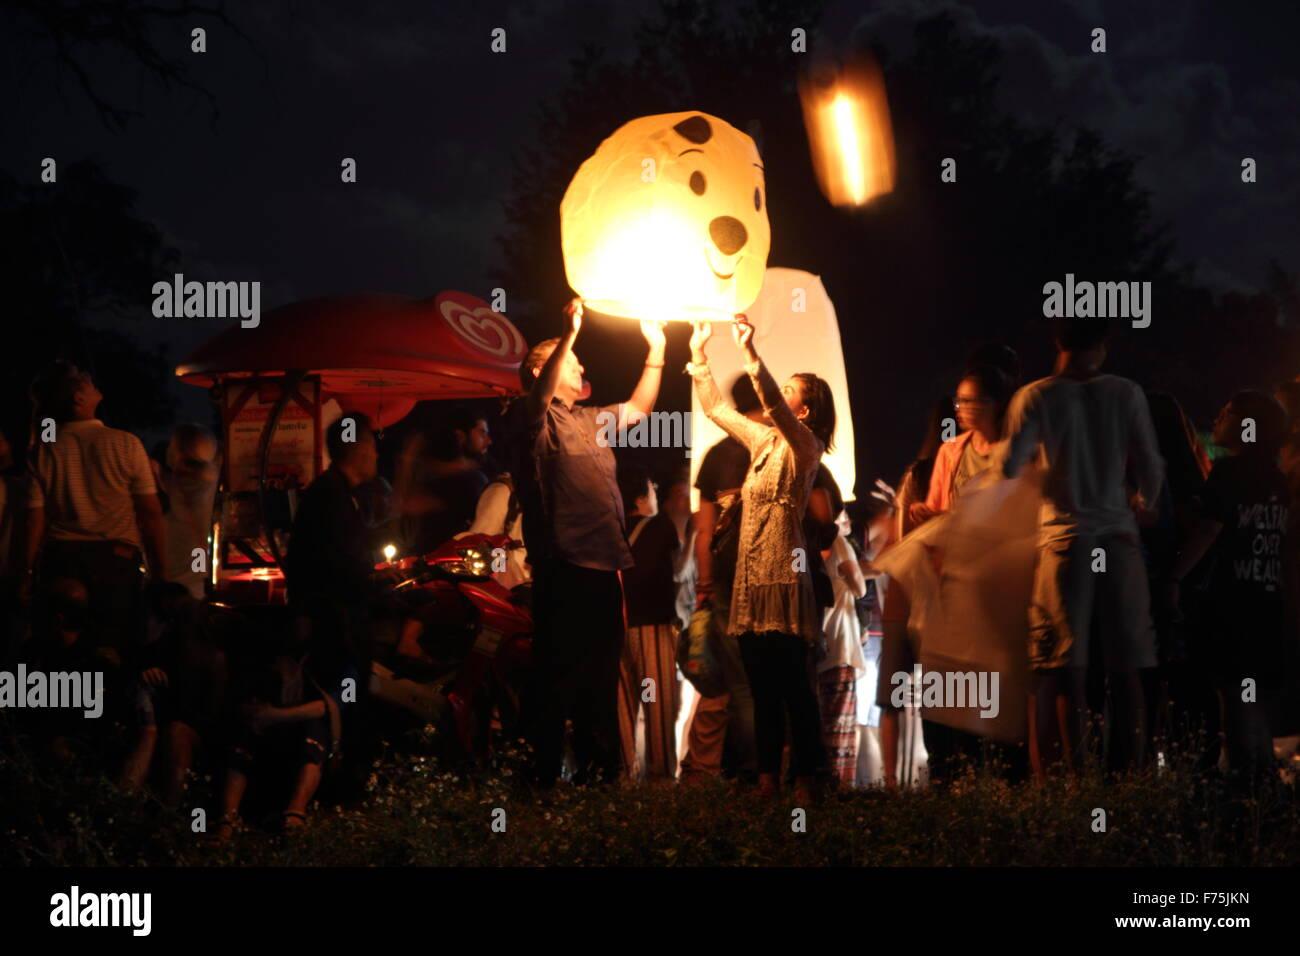 Chiang Mai, Thailand. 25. November 2015. Touristen versammeln, um freizugeben Khom Loi (Himmelslaterne) während Stockfoto